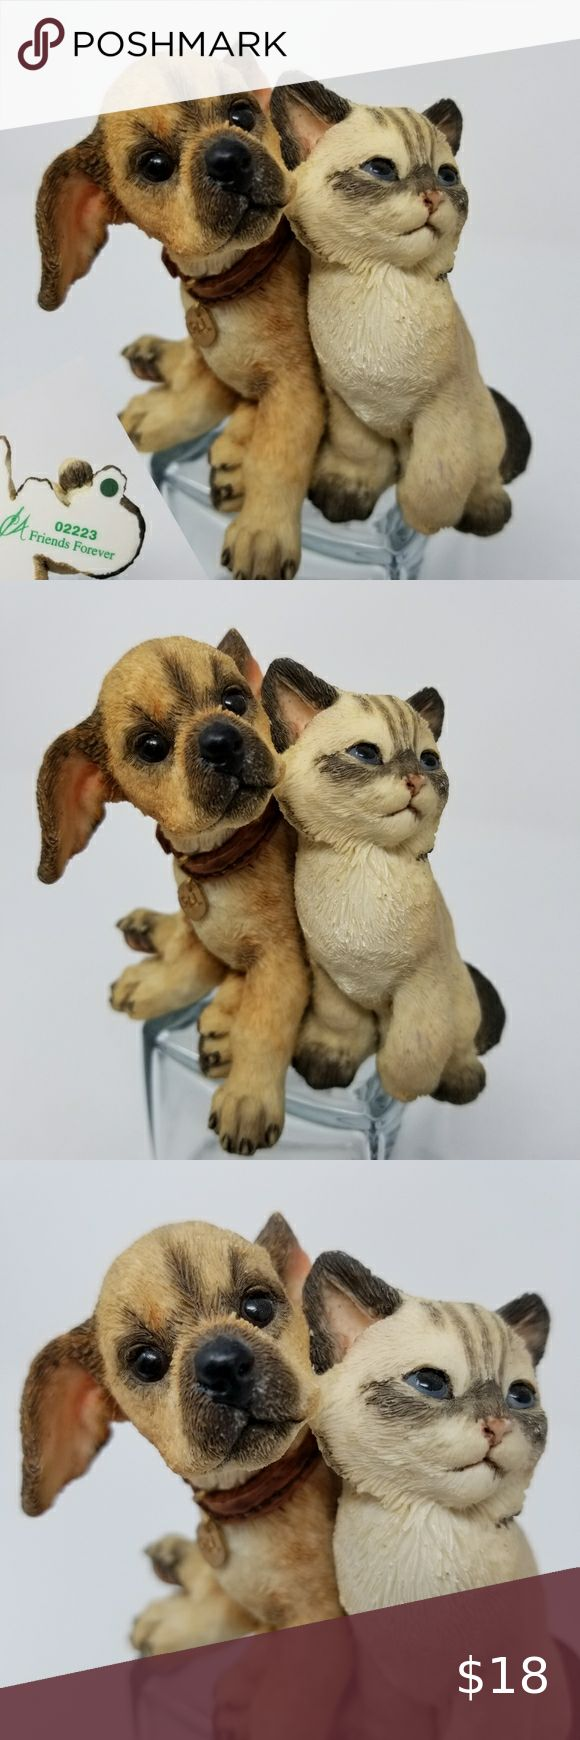 Ca Figurine Puppy Kitten Dog Cat Friends Forever Ca Figurine Puppy Kitten Dog Cat Friends Forever Numbered 02223 Box 3 Ca Other In 2020 Kitten Dog Cat Puppies